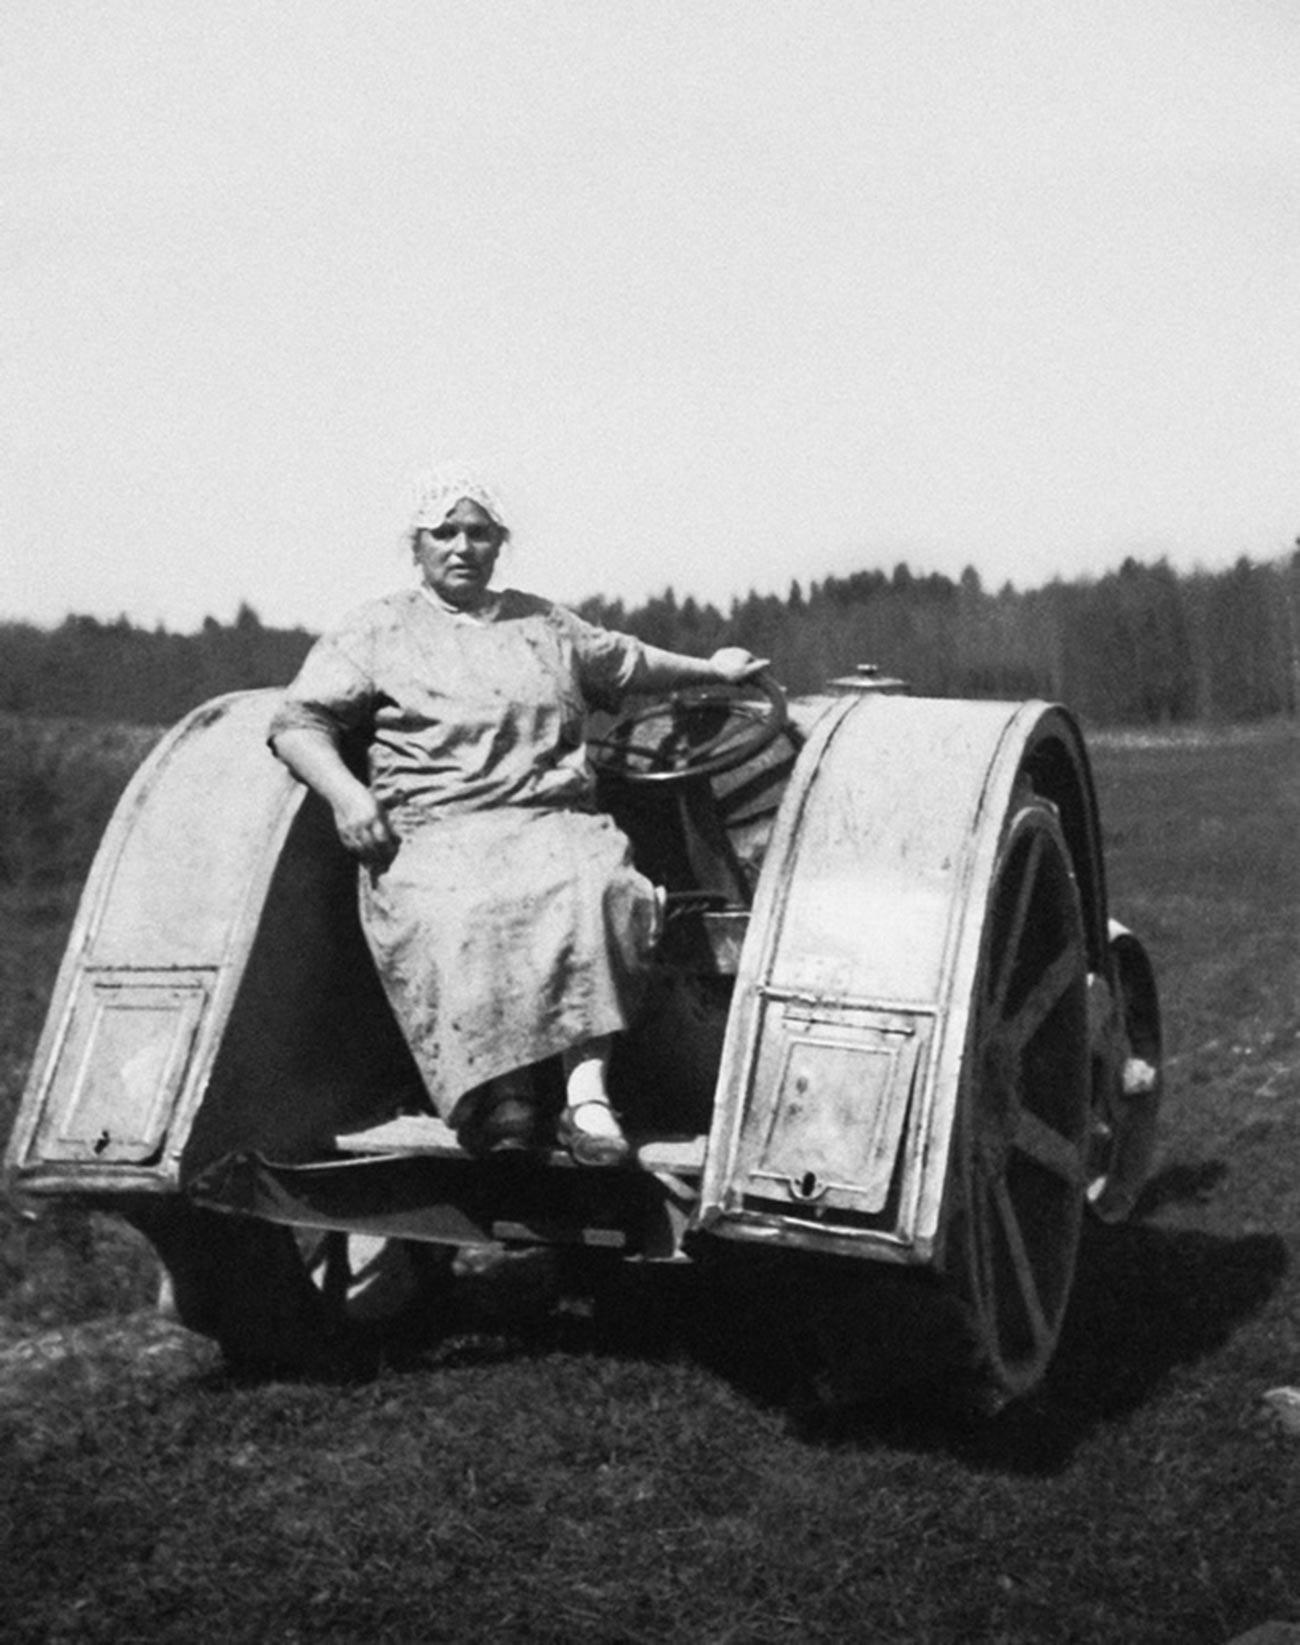 Seorang perempuan tua berpose di atas traktor.